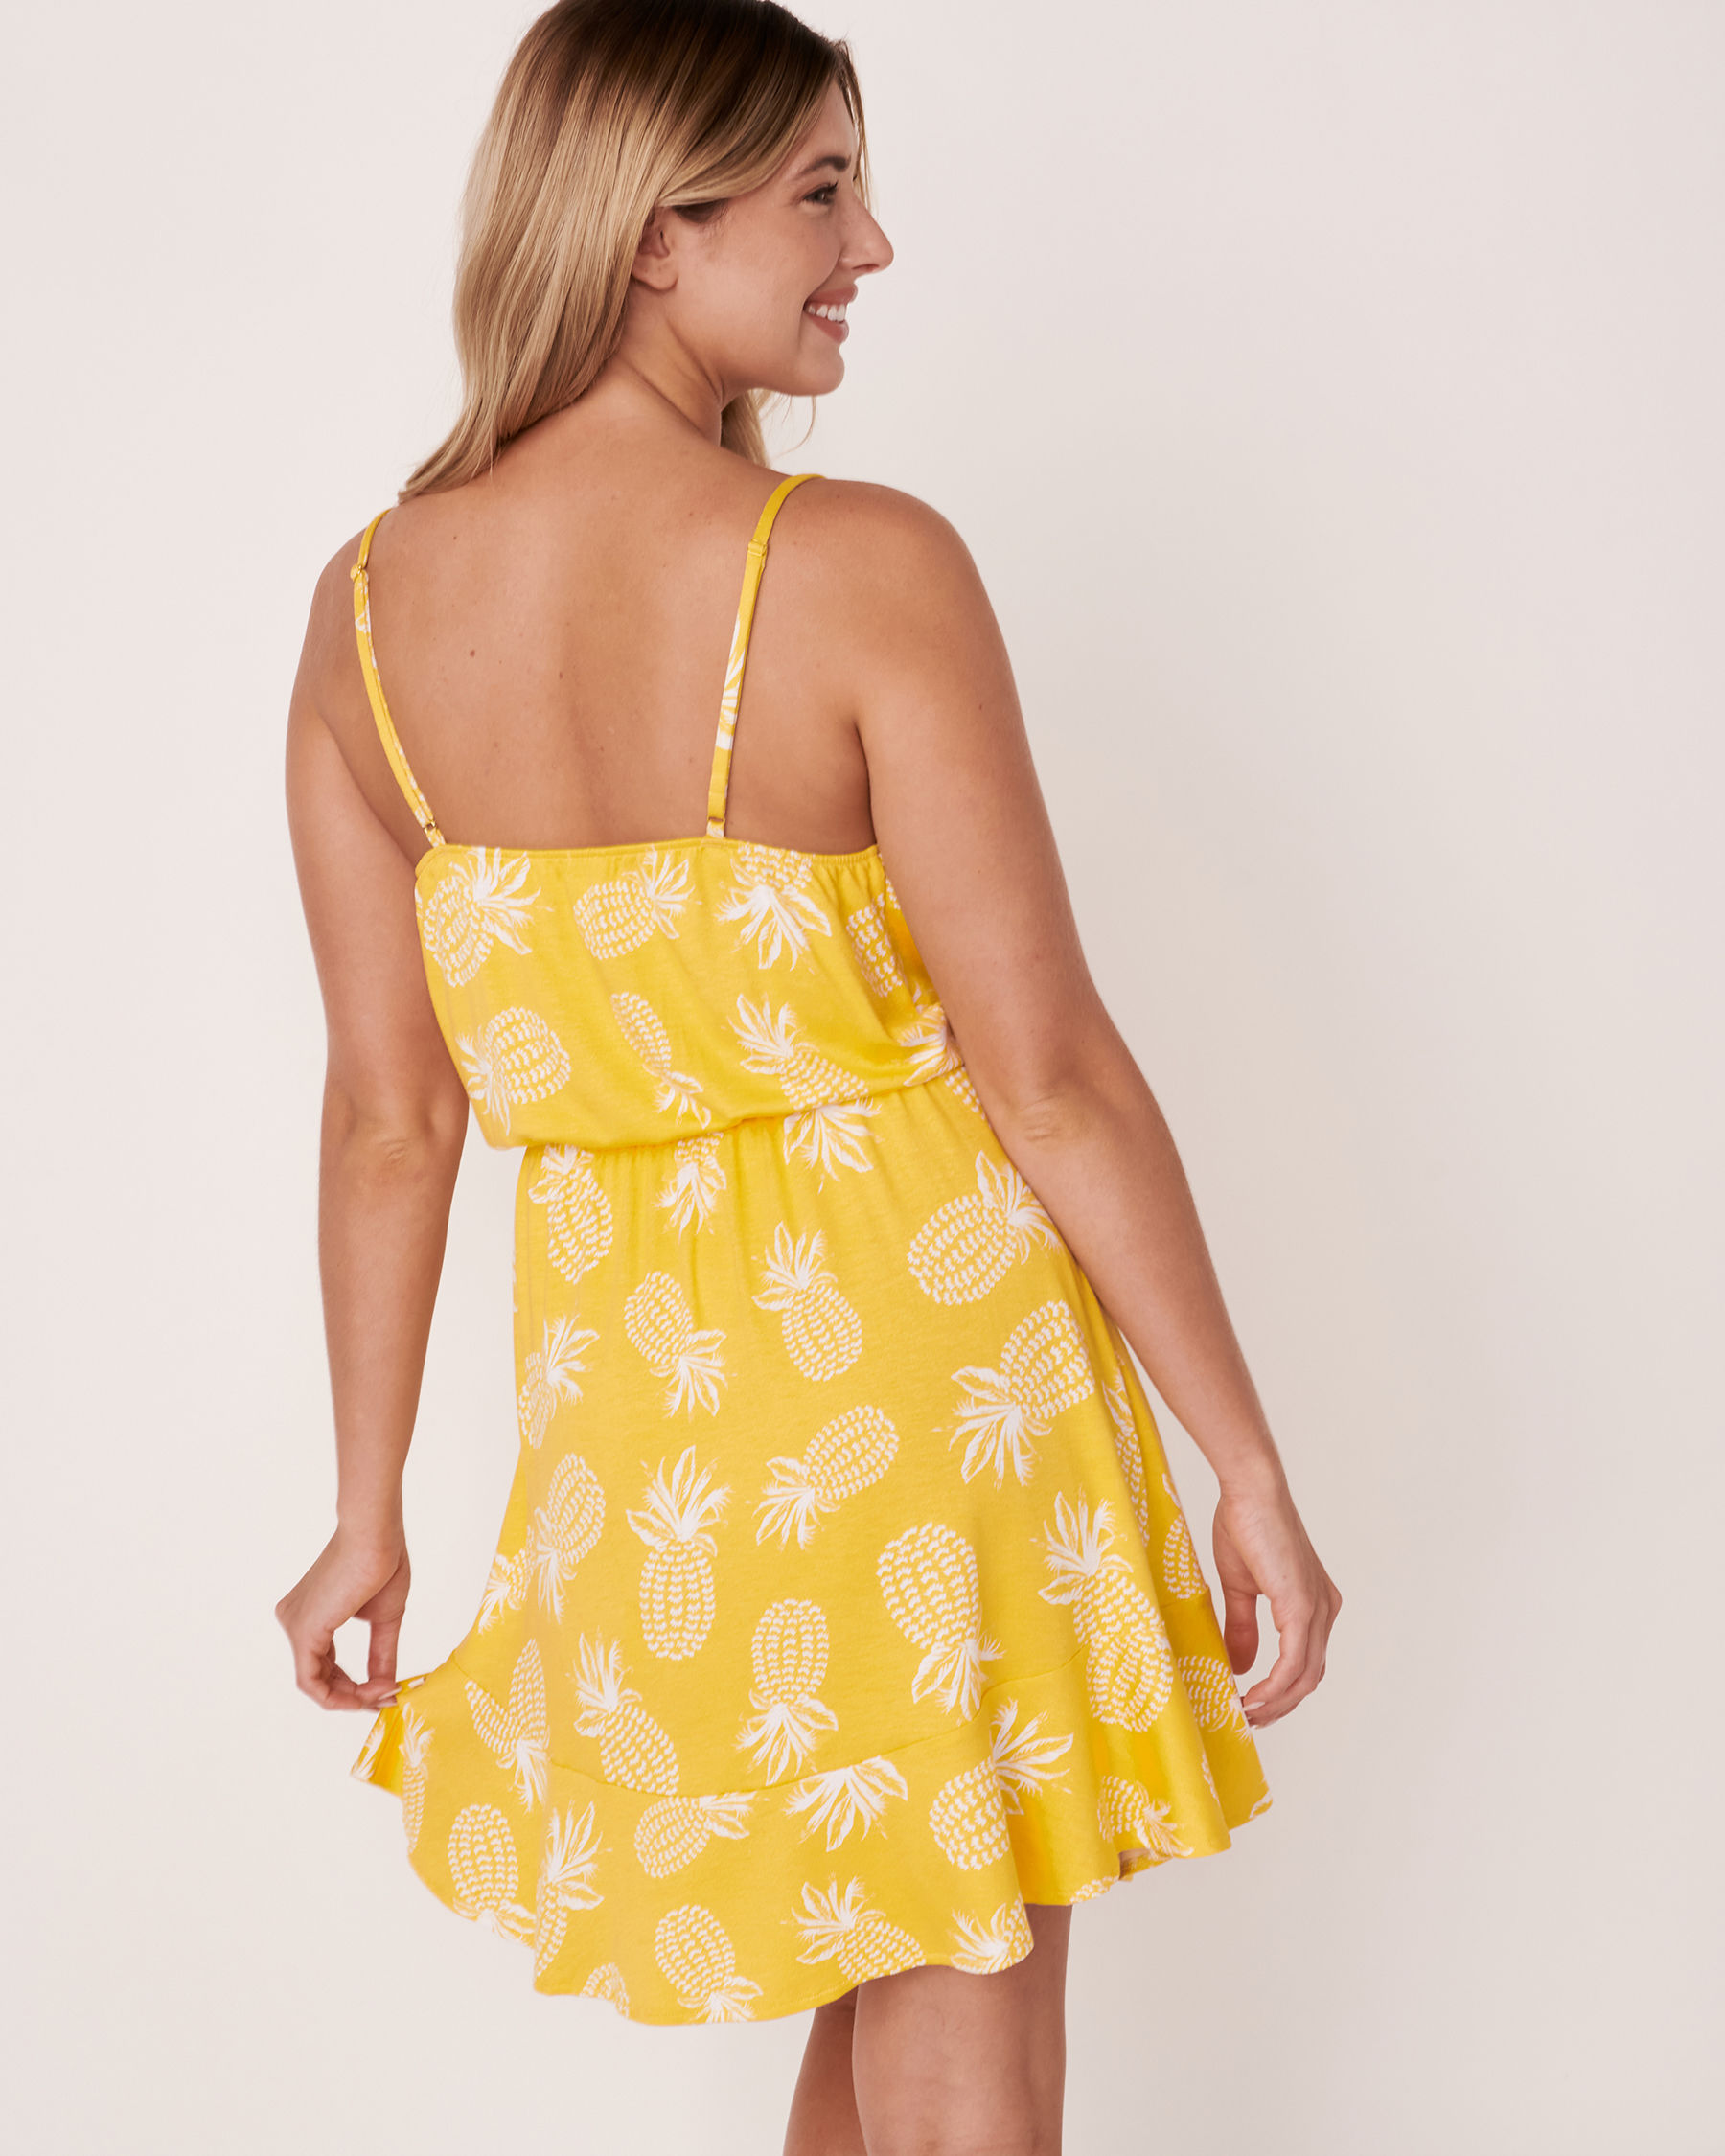 LA VIE EN ROSE AQUA Short Ruffle Dress Pineapple print 80300016 - View2